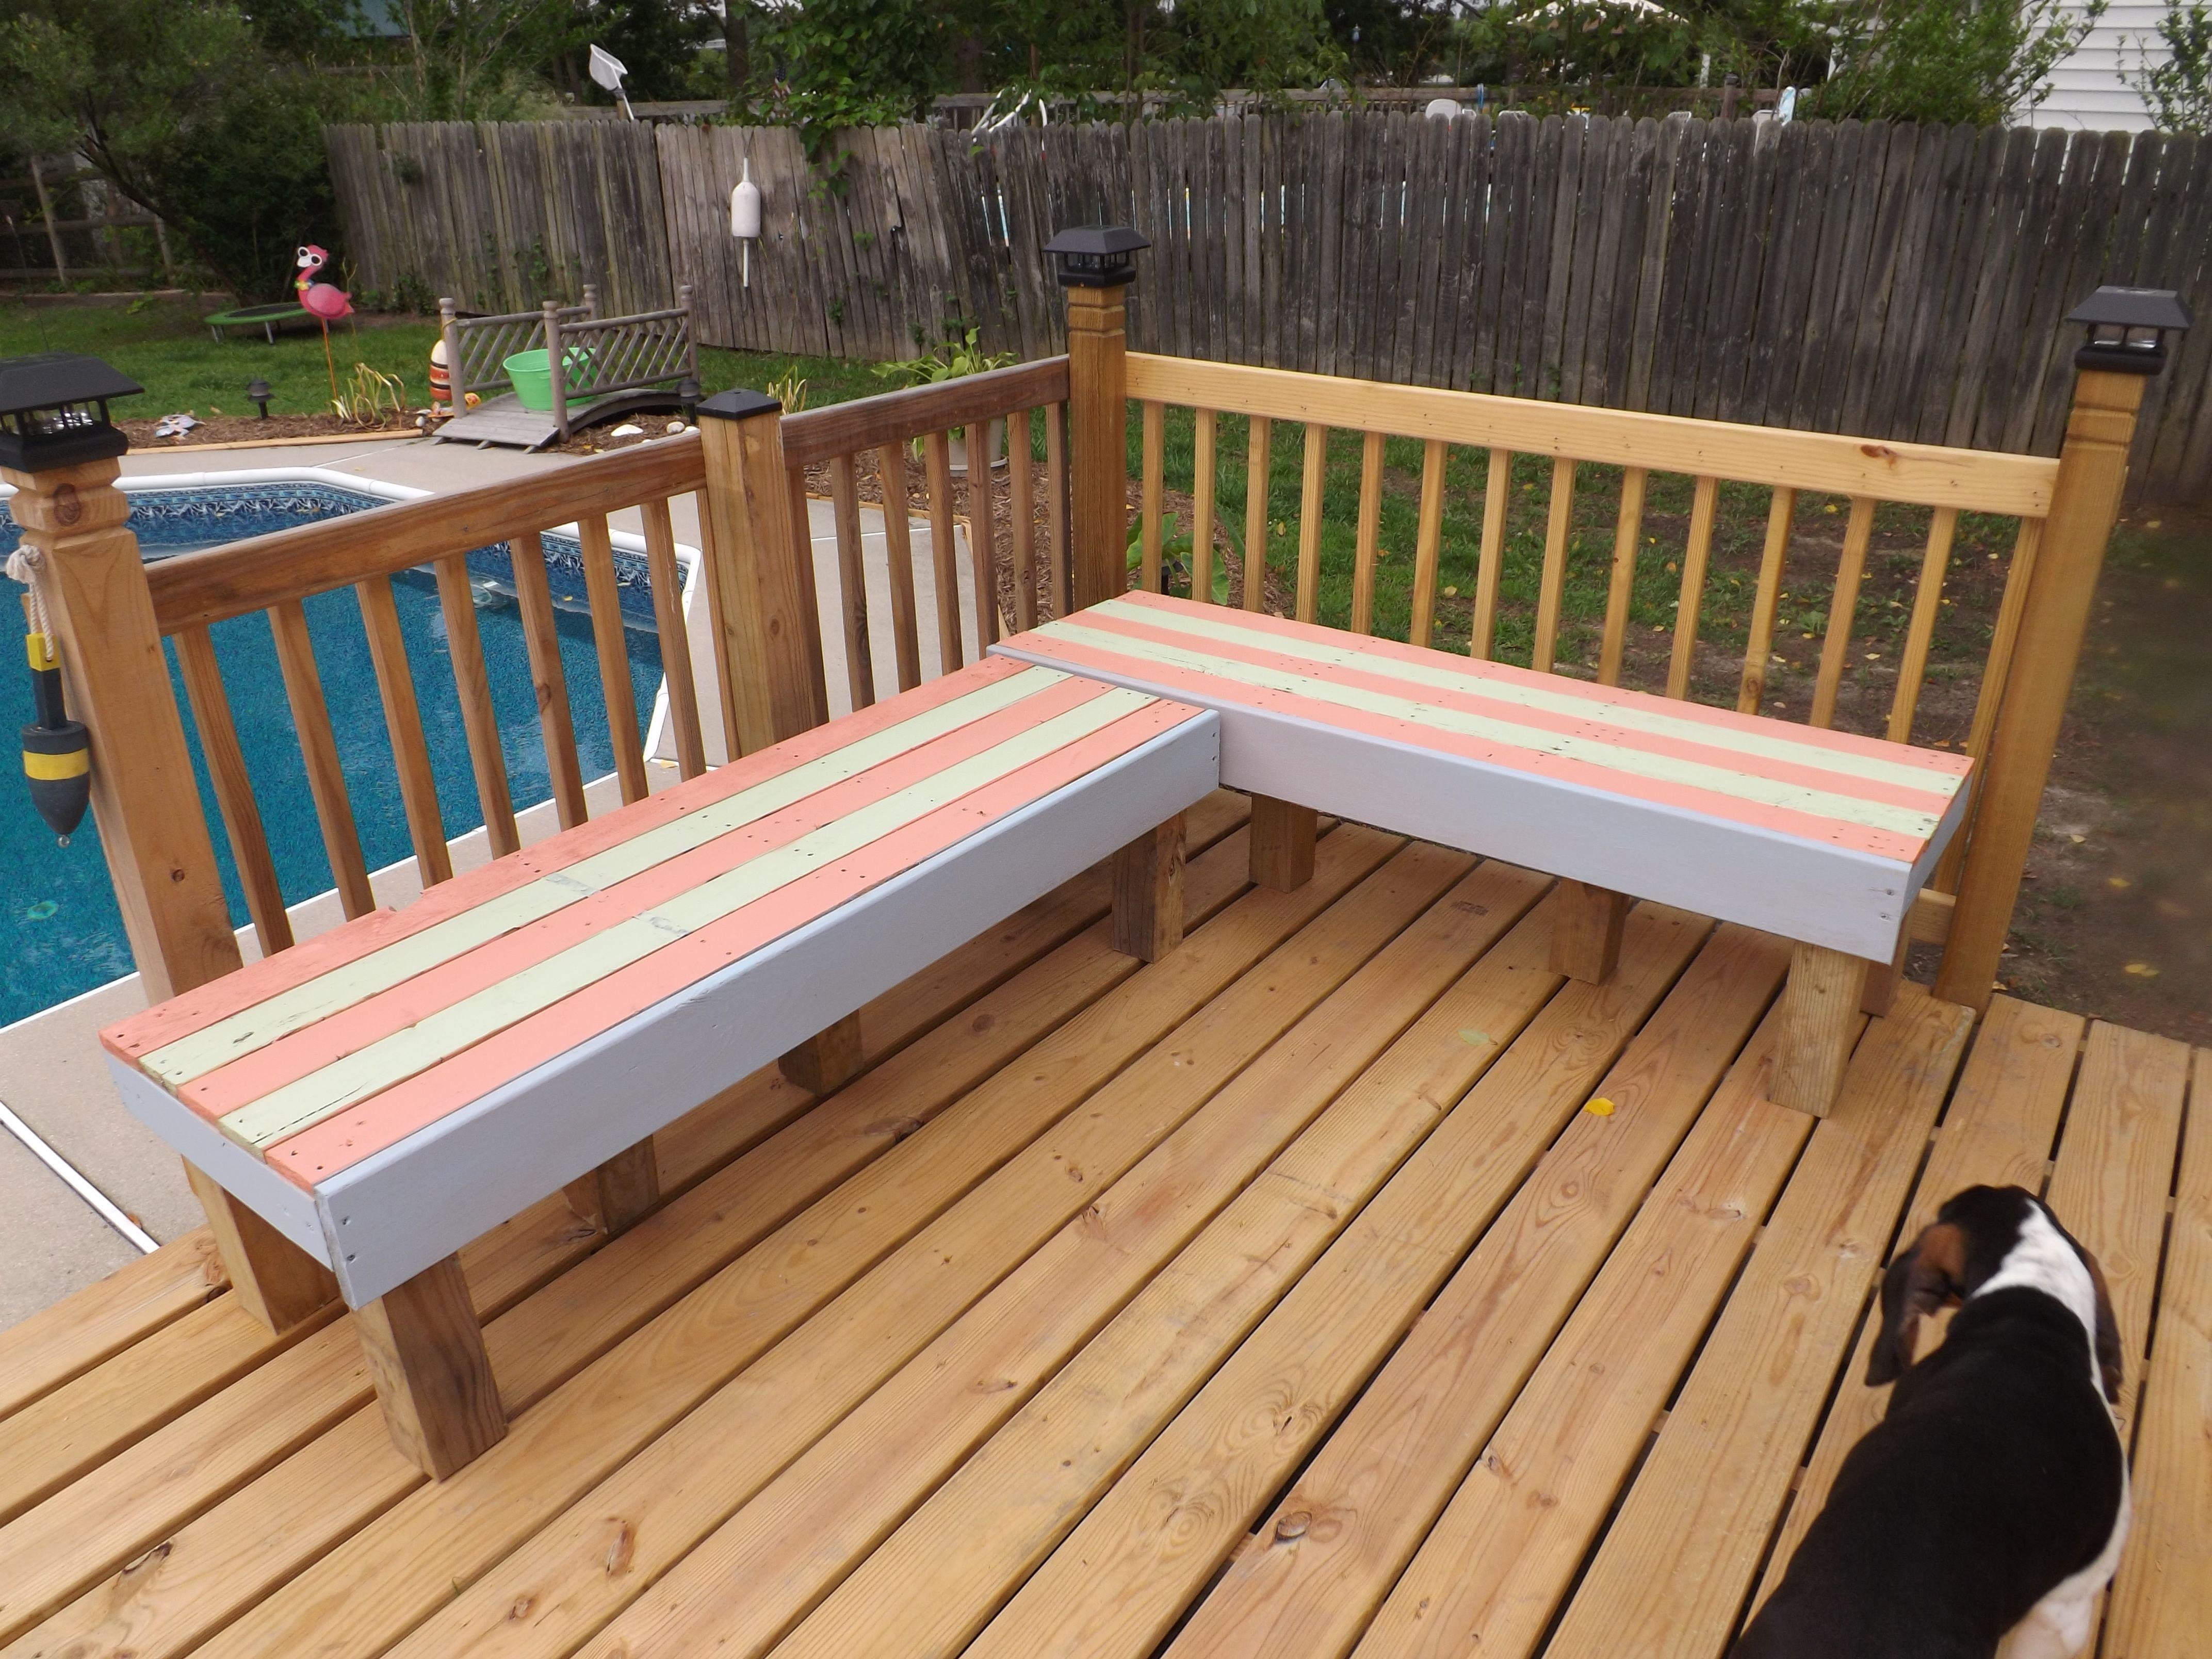 Deck pallet benches | for Tim | Pinterest